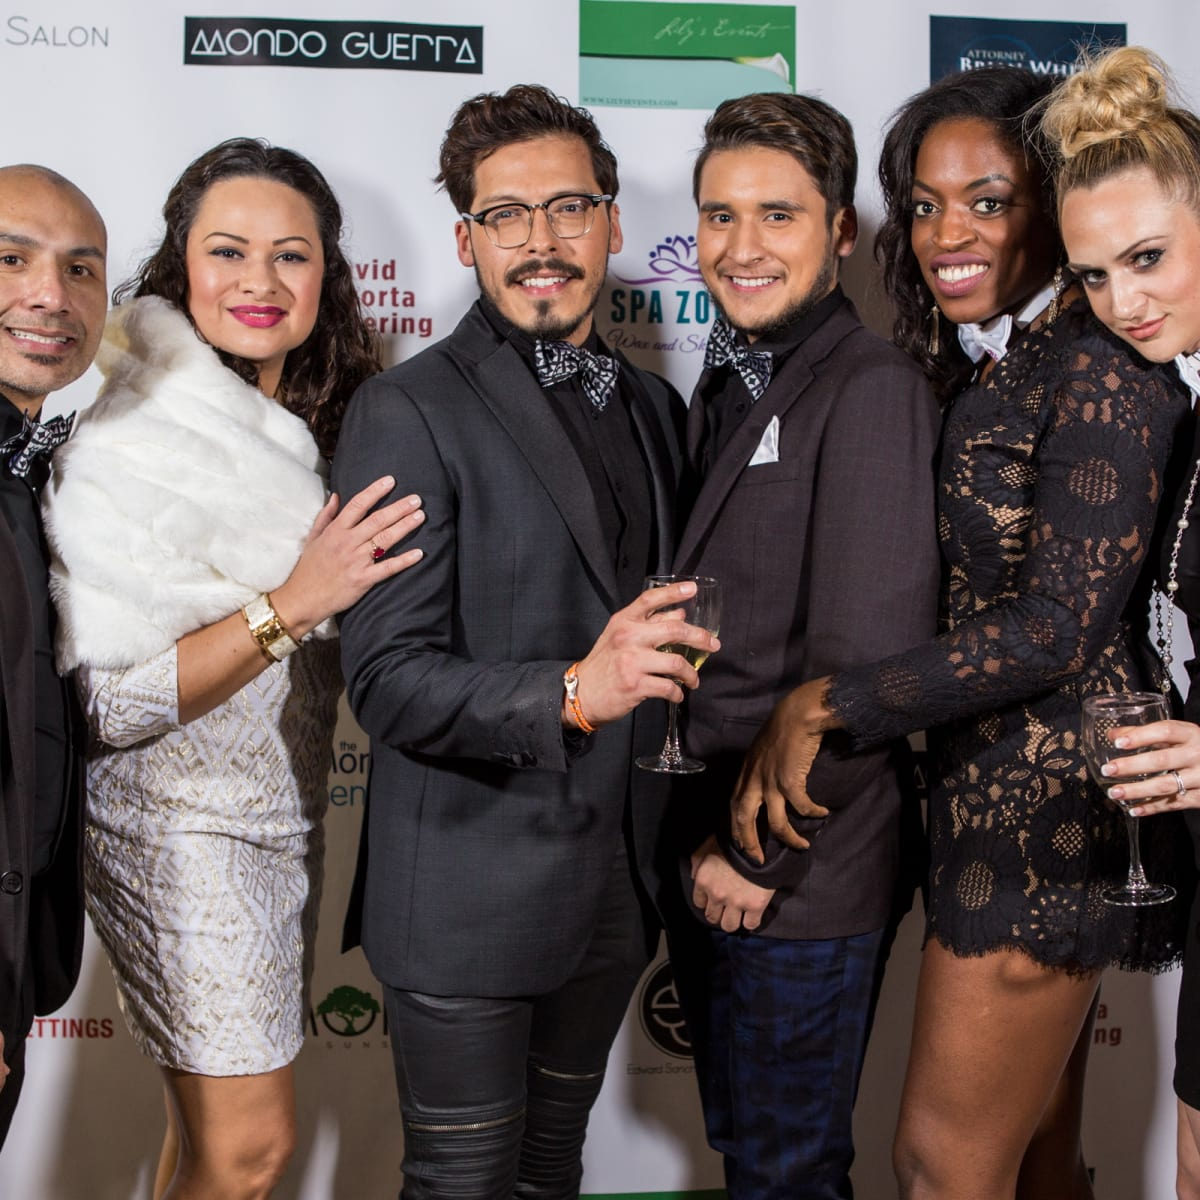 Mondo Guerra event Angel Reyes, Zoey Smallwood, David Armendariz, Jesse Gudino, Bunmi Bush, Jessie Raak